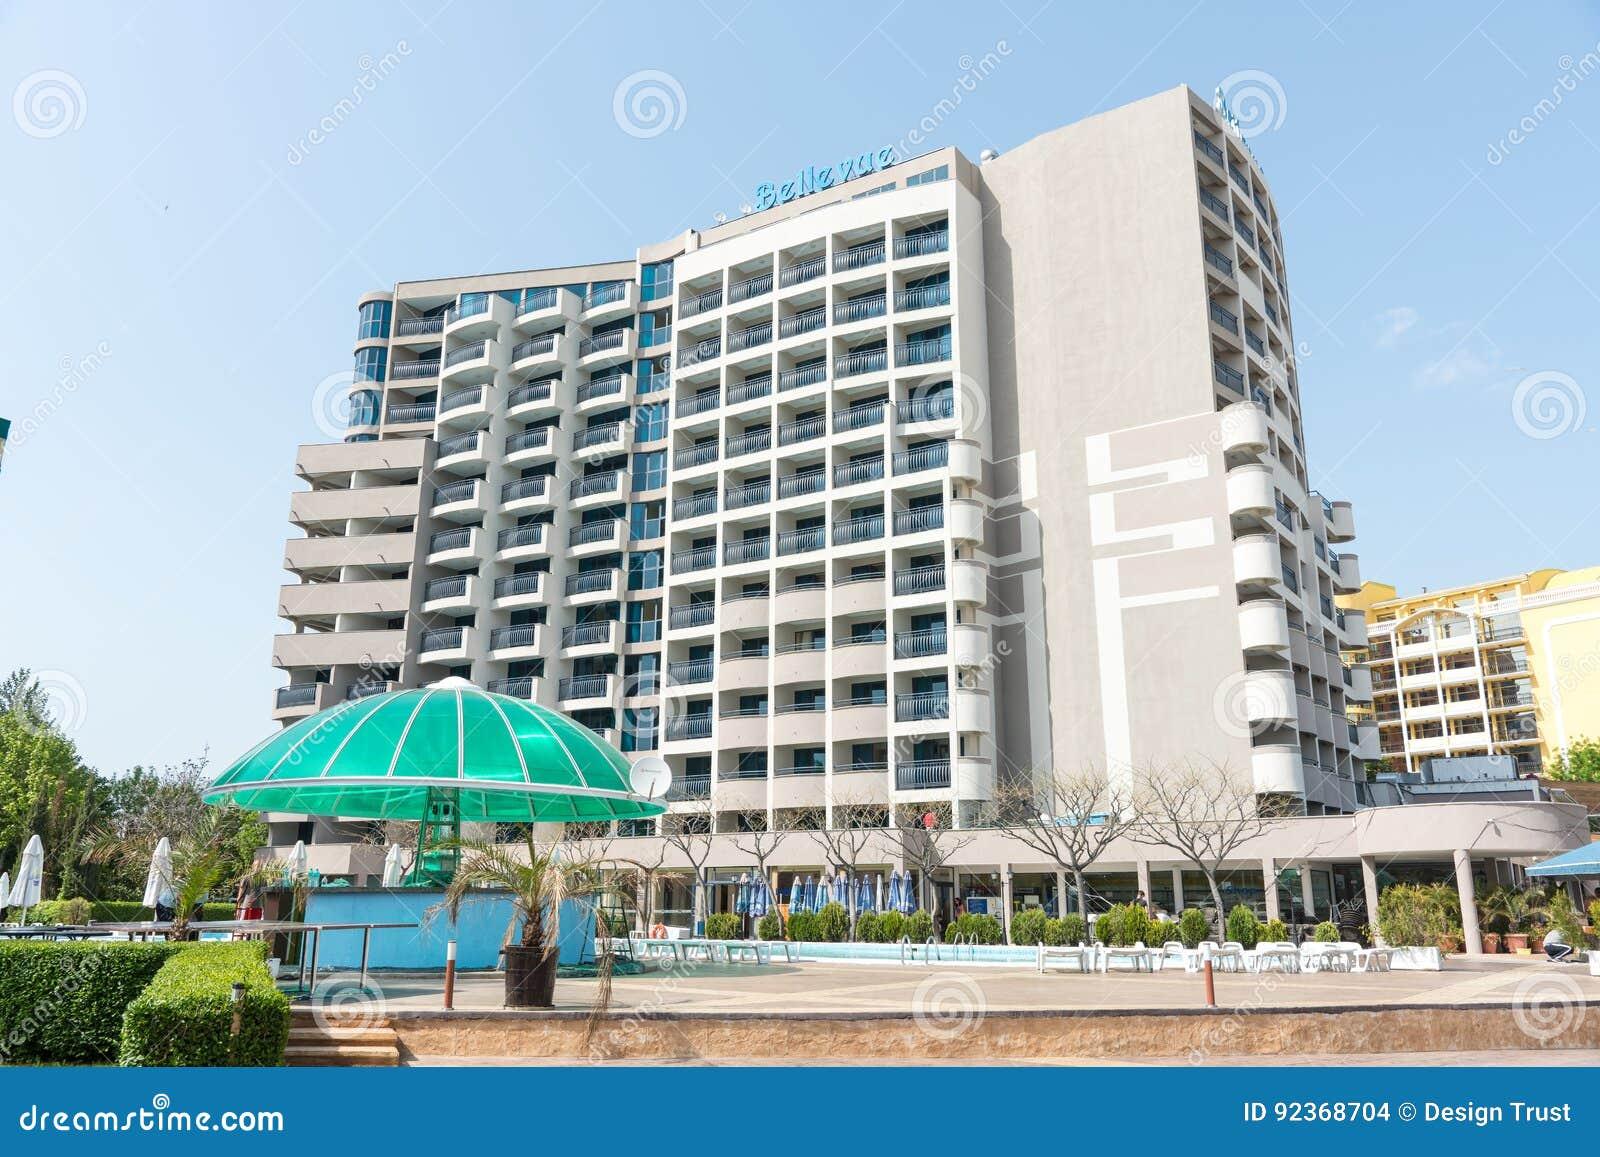 Hotel Bellevue In Sunny Beach In Bulgaria Editorial Stock Image